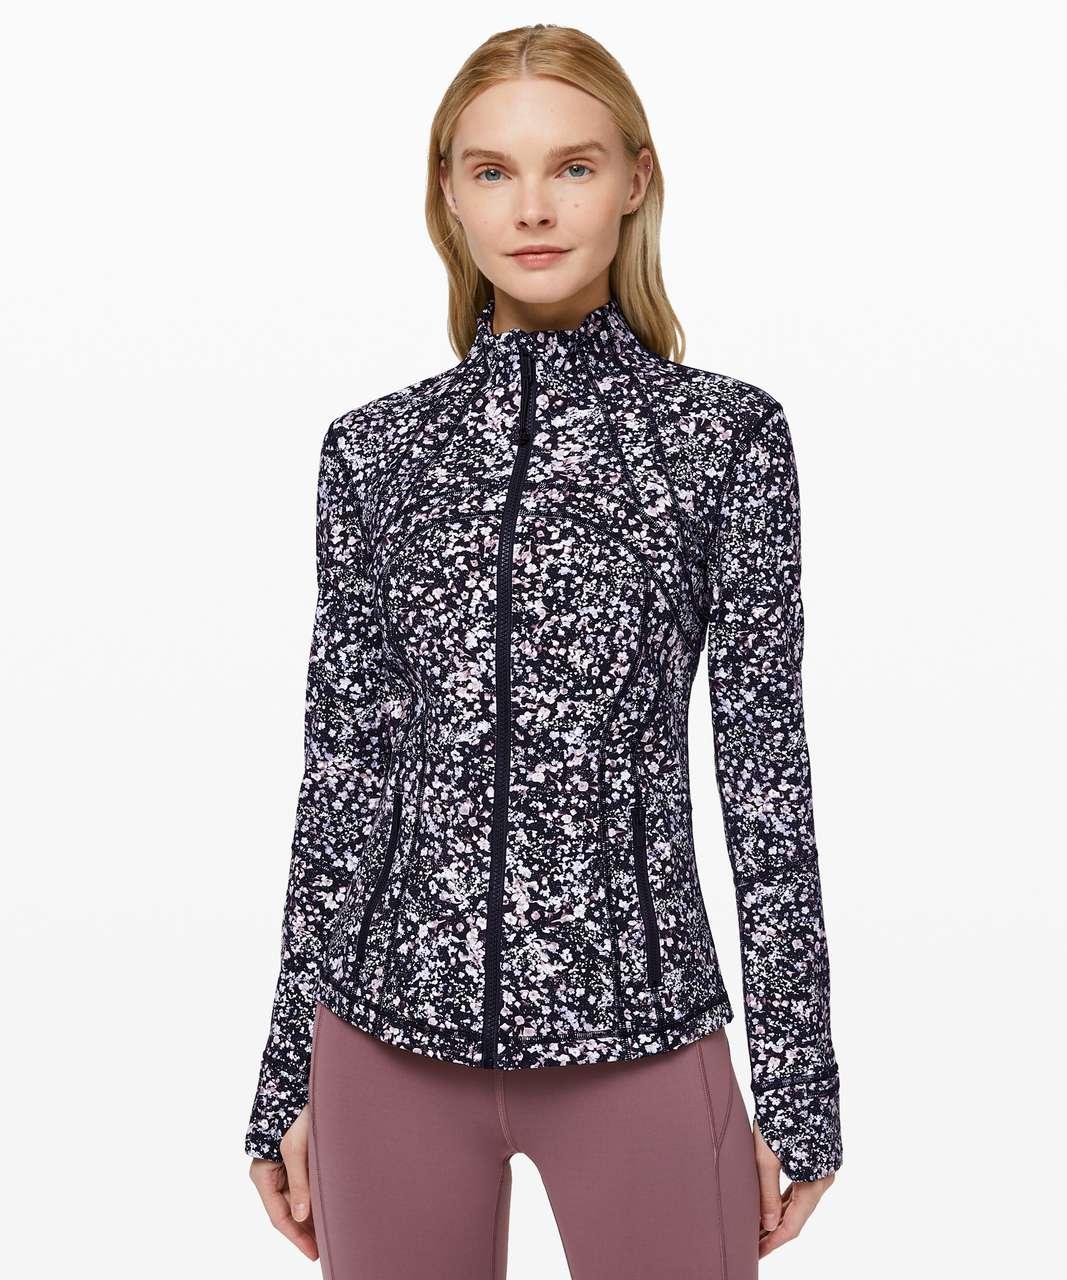 Lululemon Define Jacket - Floral Spritz Multi